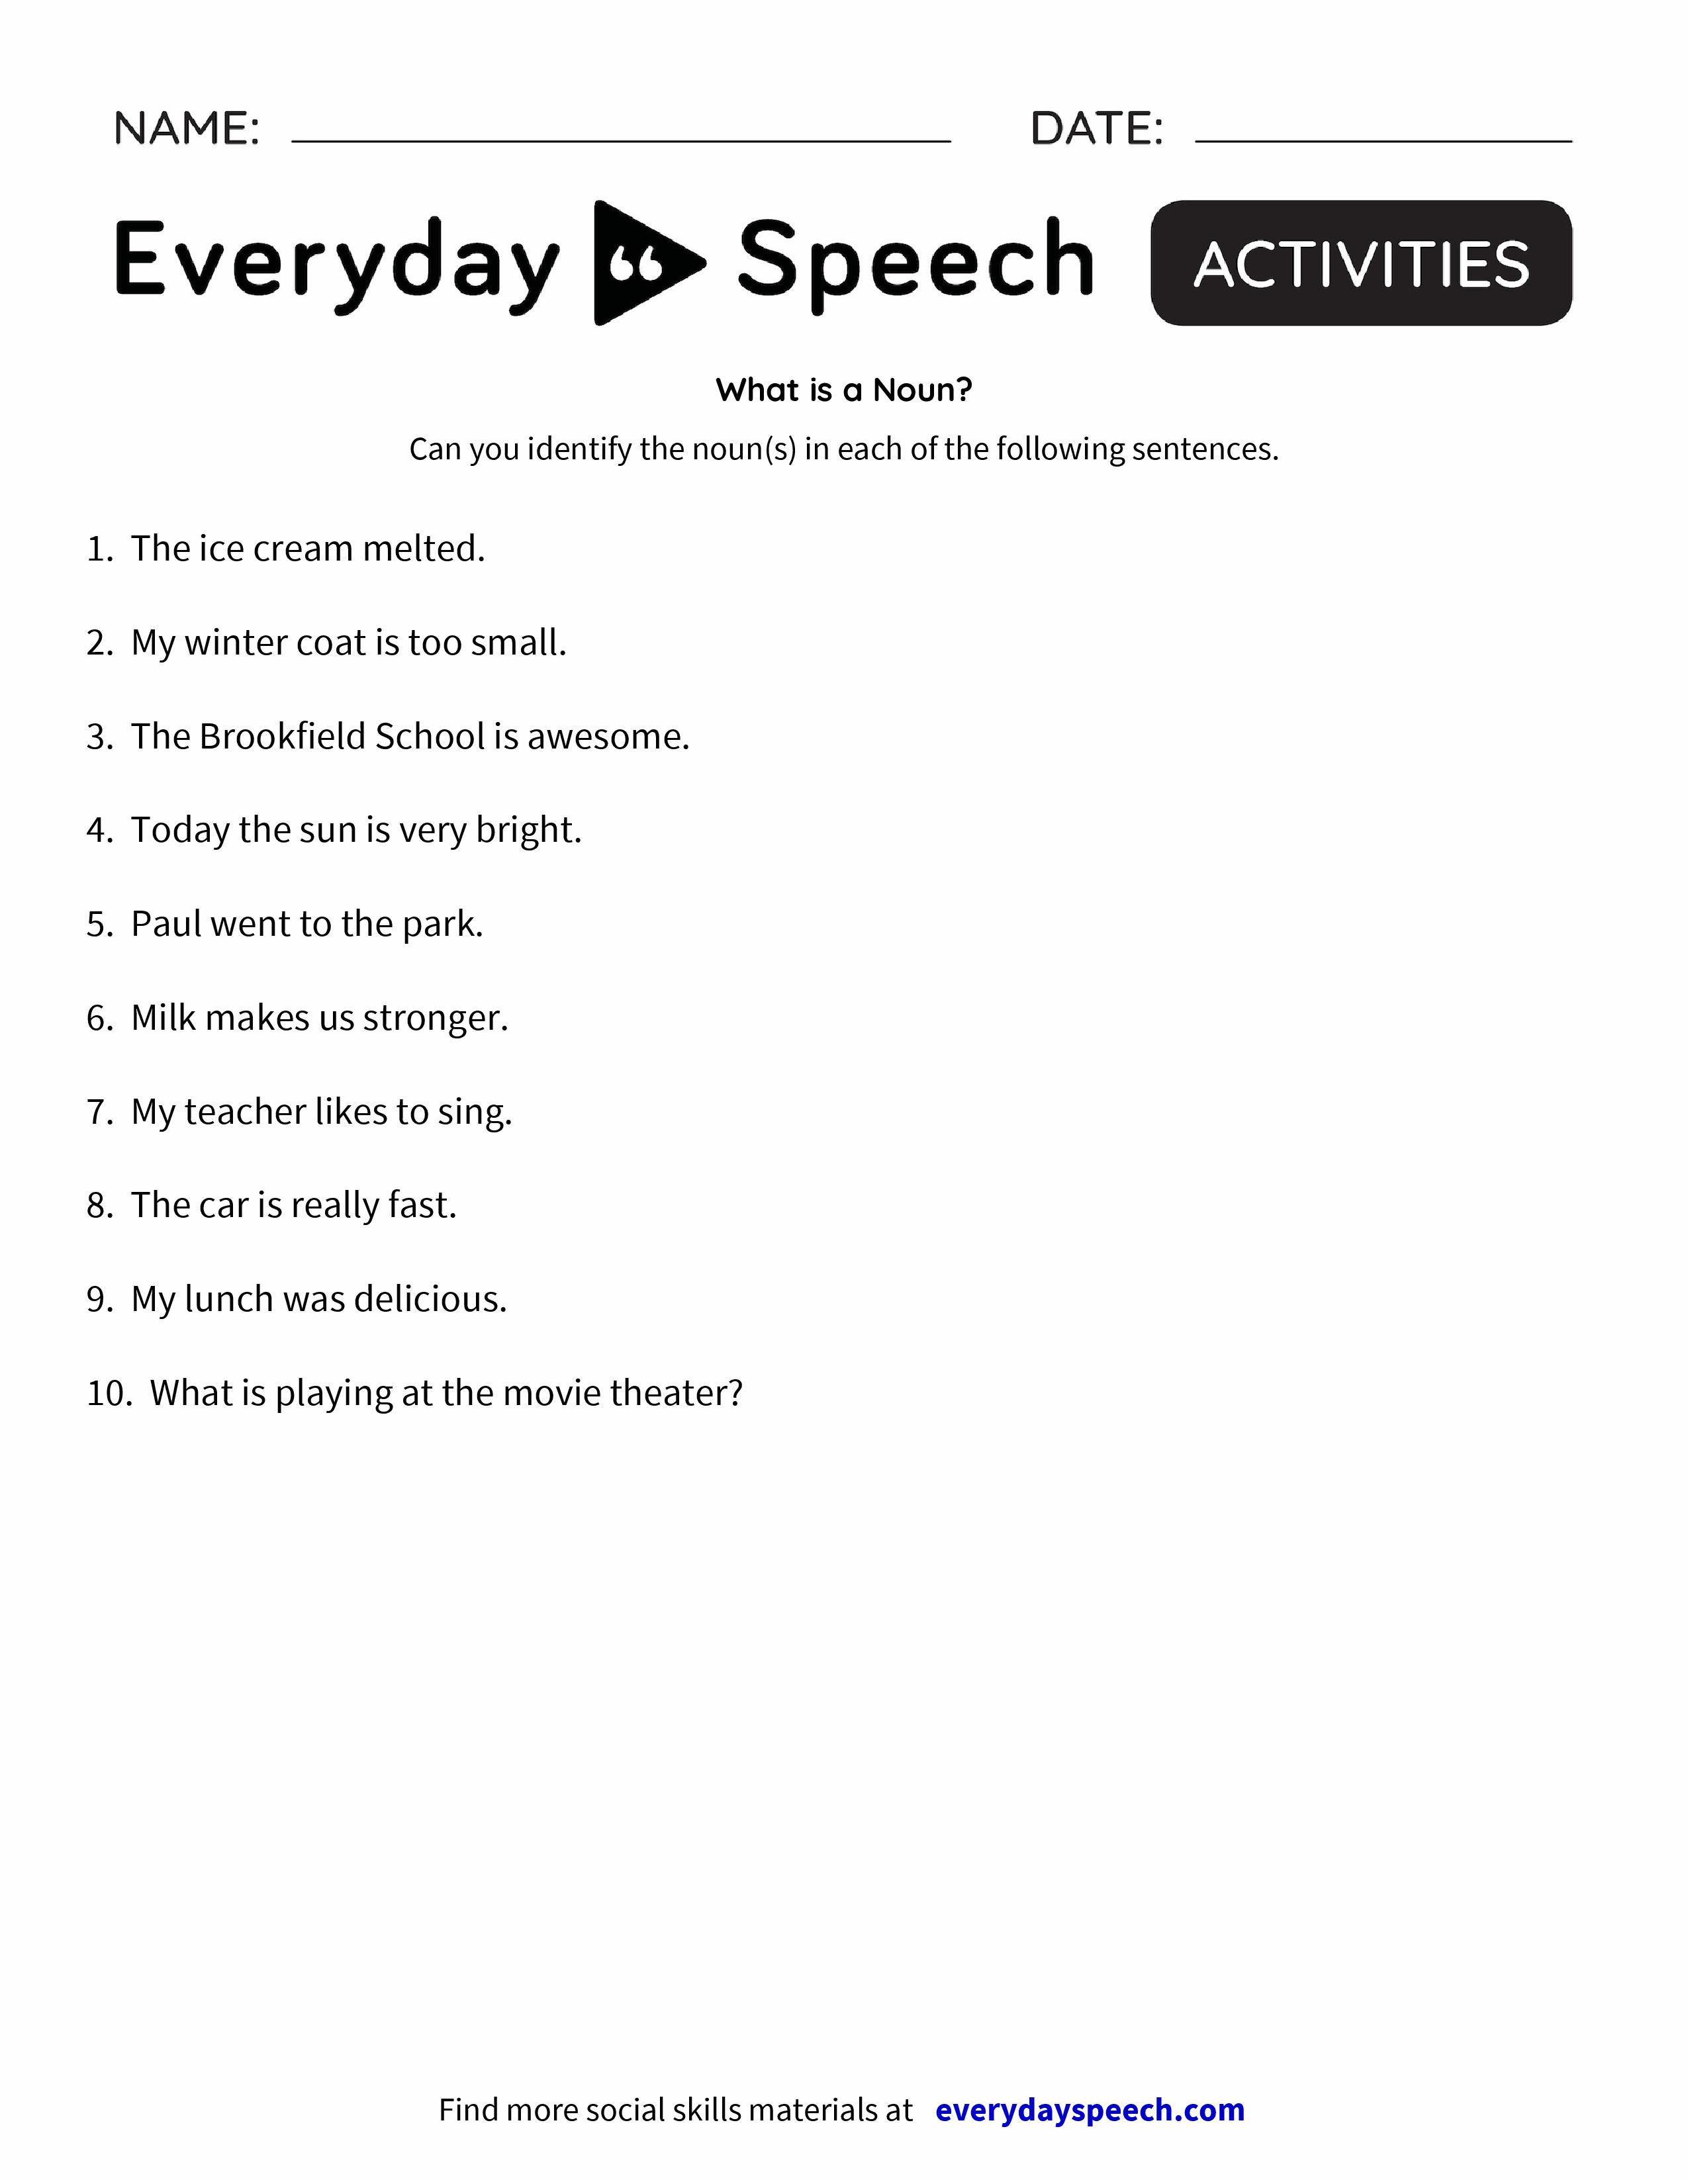 What is a Noun Everyday Speech Everyday Speech – What is a Worksheet